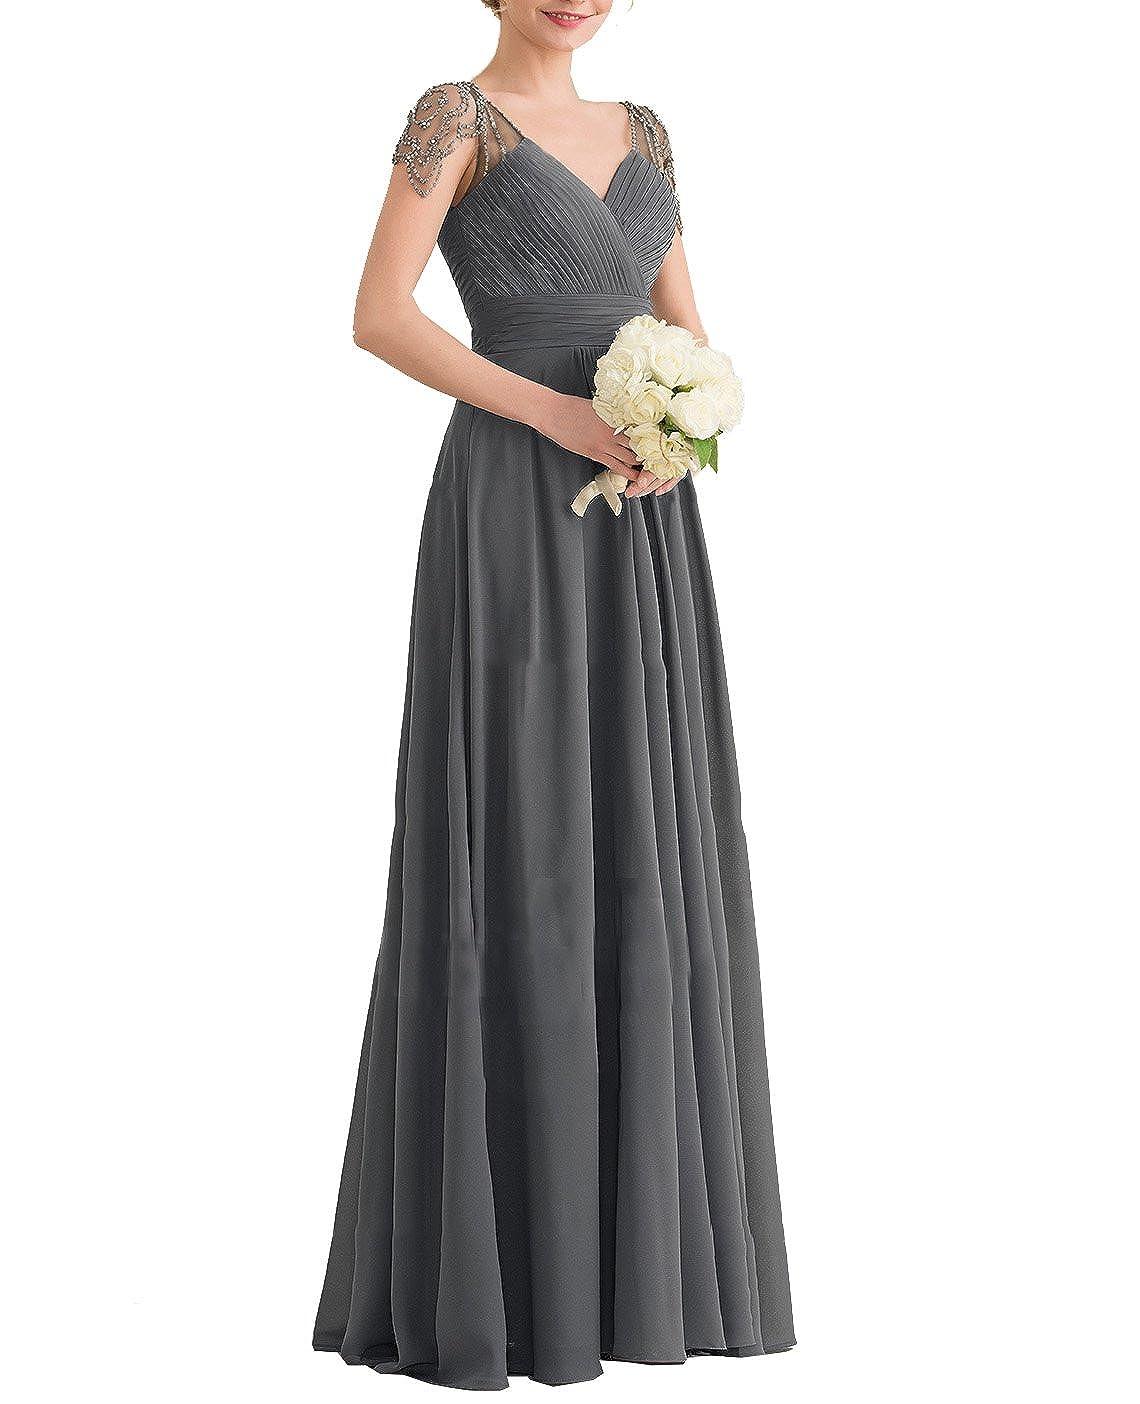 Nicefashion V Neck Beaded Cap Sleeves Chiffon Long Evening Bridesmaid Dress